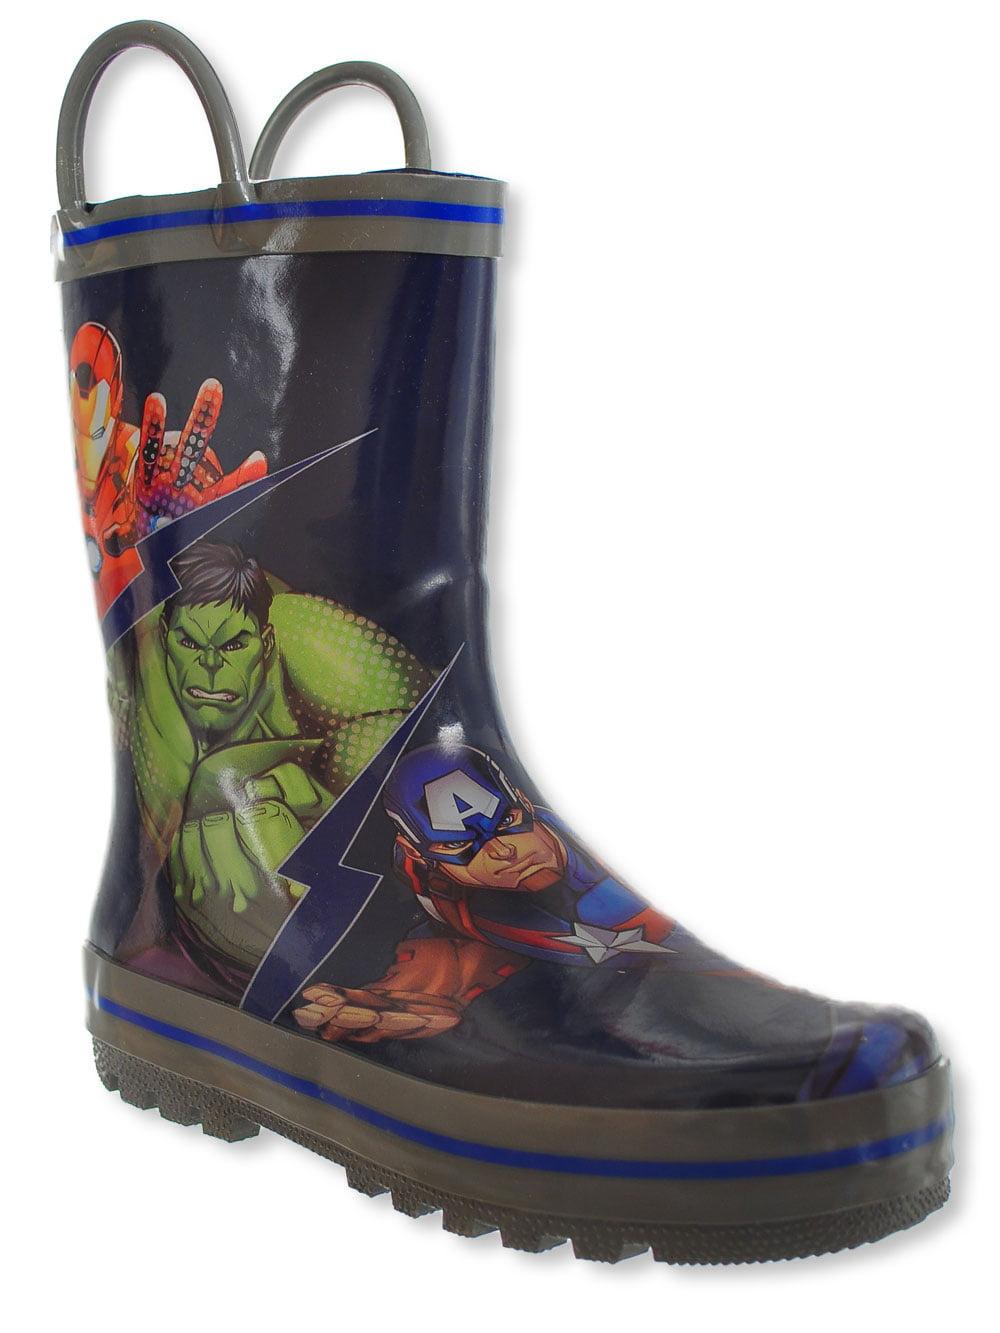 Marvel Avengers Boys' Rain Boots (Sizes